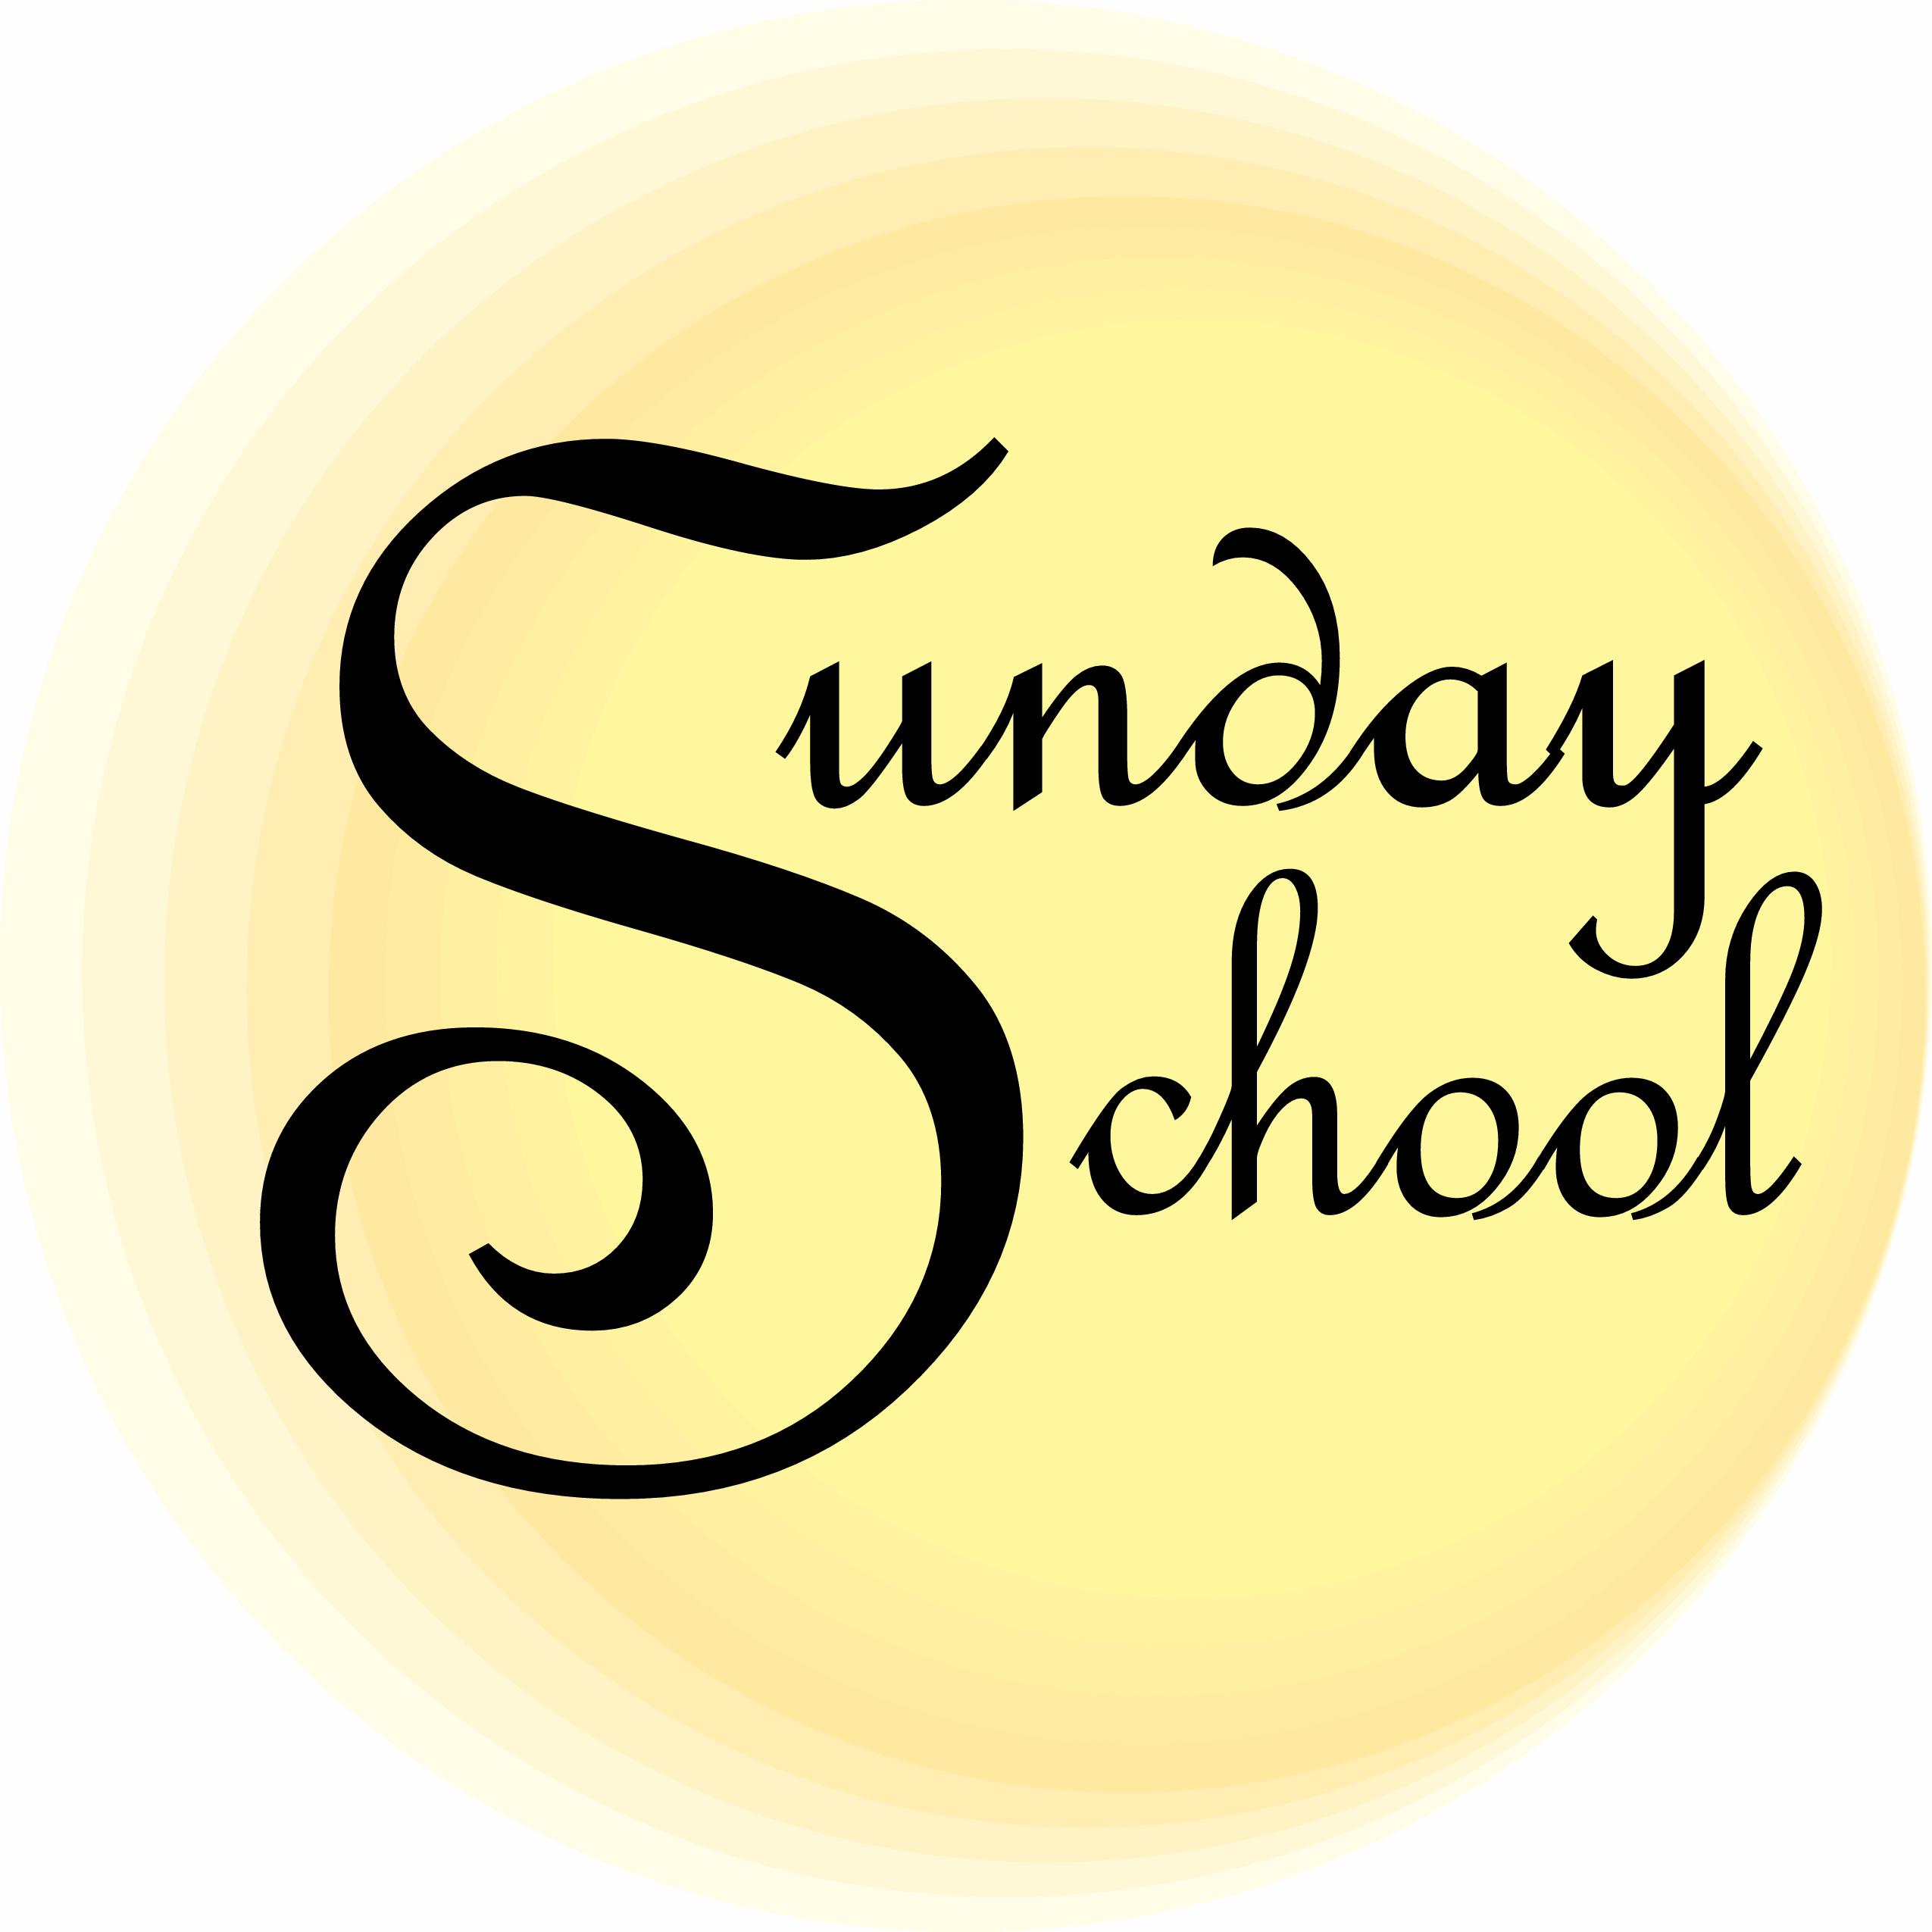 Clipart of sunday school picture freeuse download Sunday School | Saint Spyridon Greek Orthodox Cathedral picture freeuse download